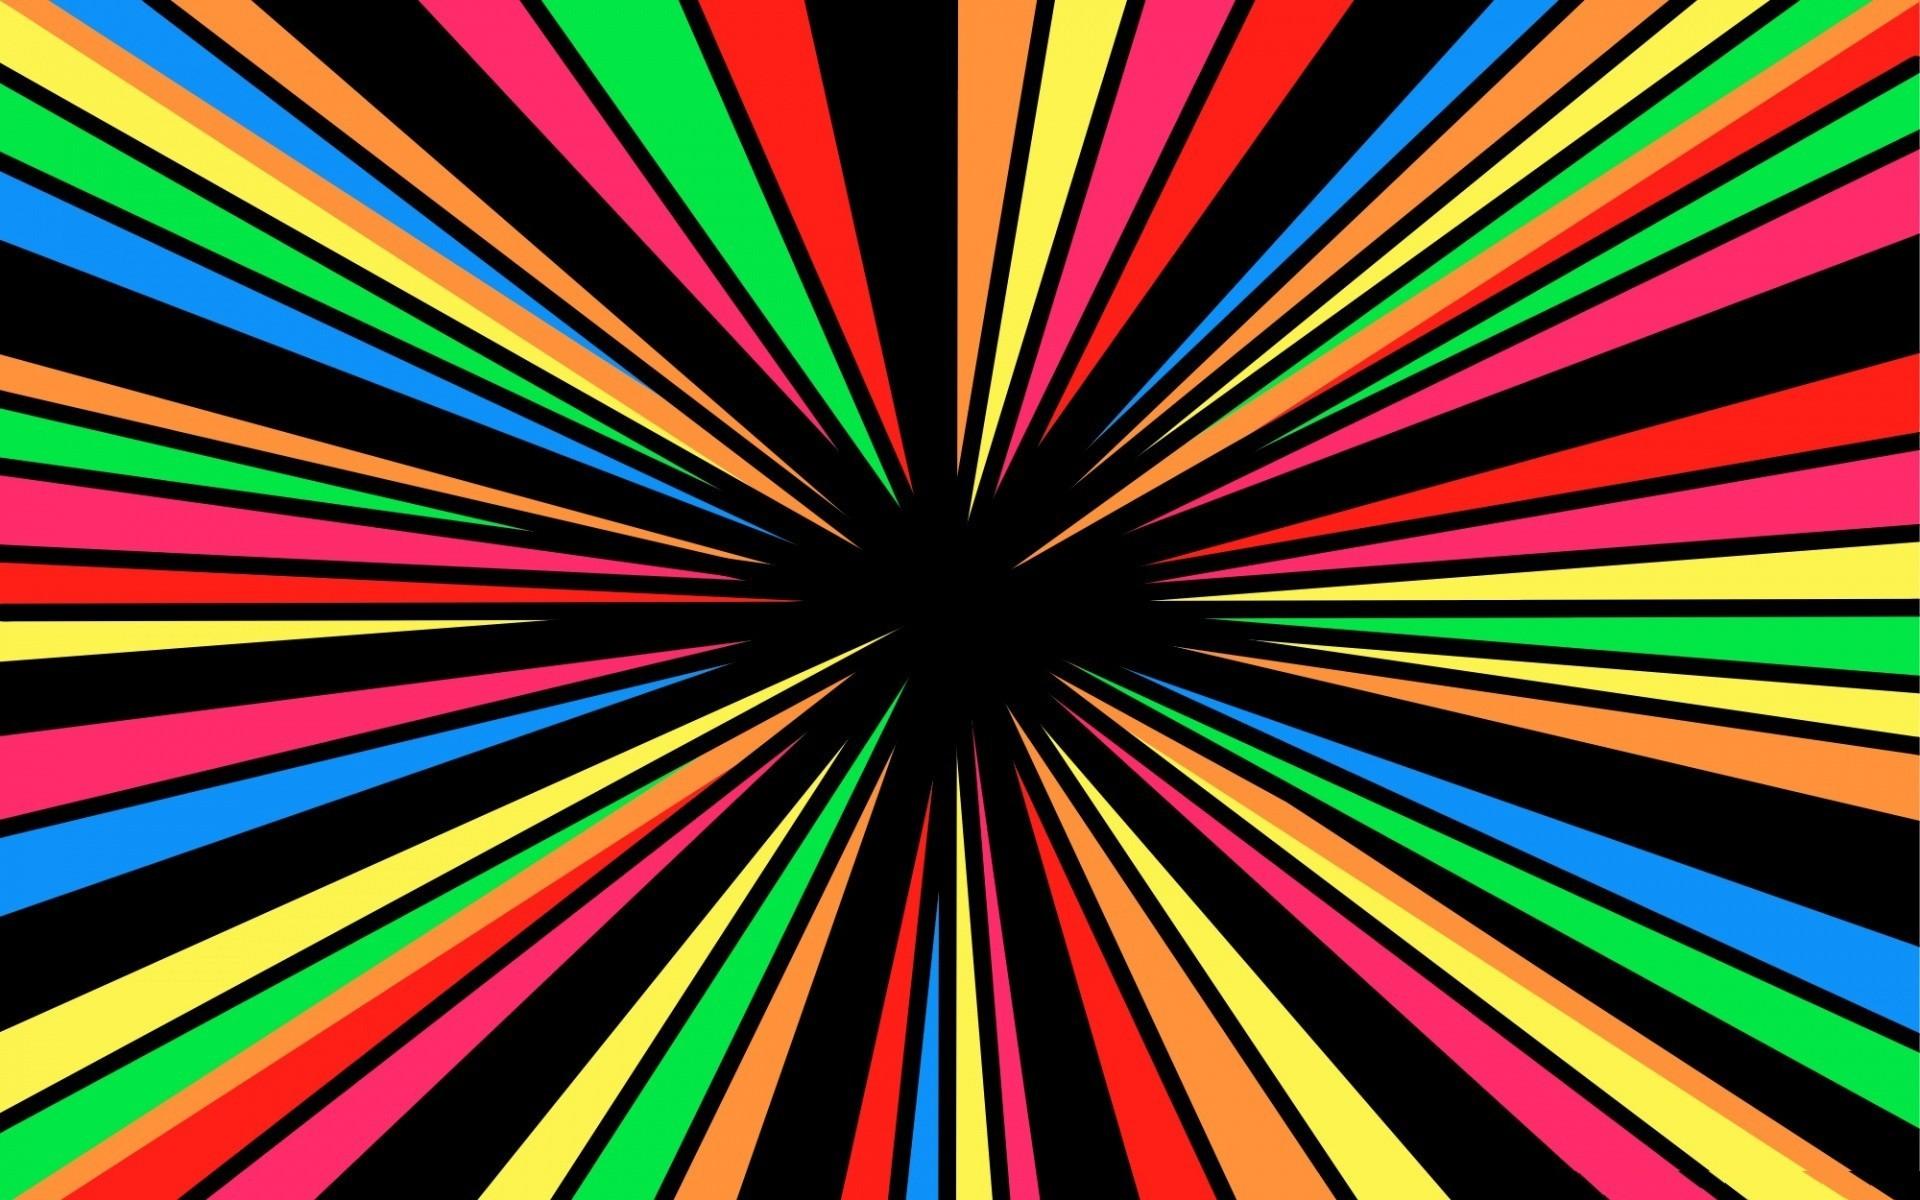 Abstract rainbows vortex colors wallpaper | | 11505 | WallpaperUP